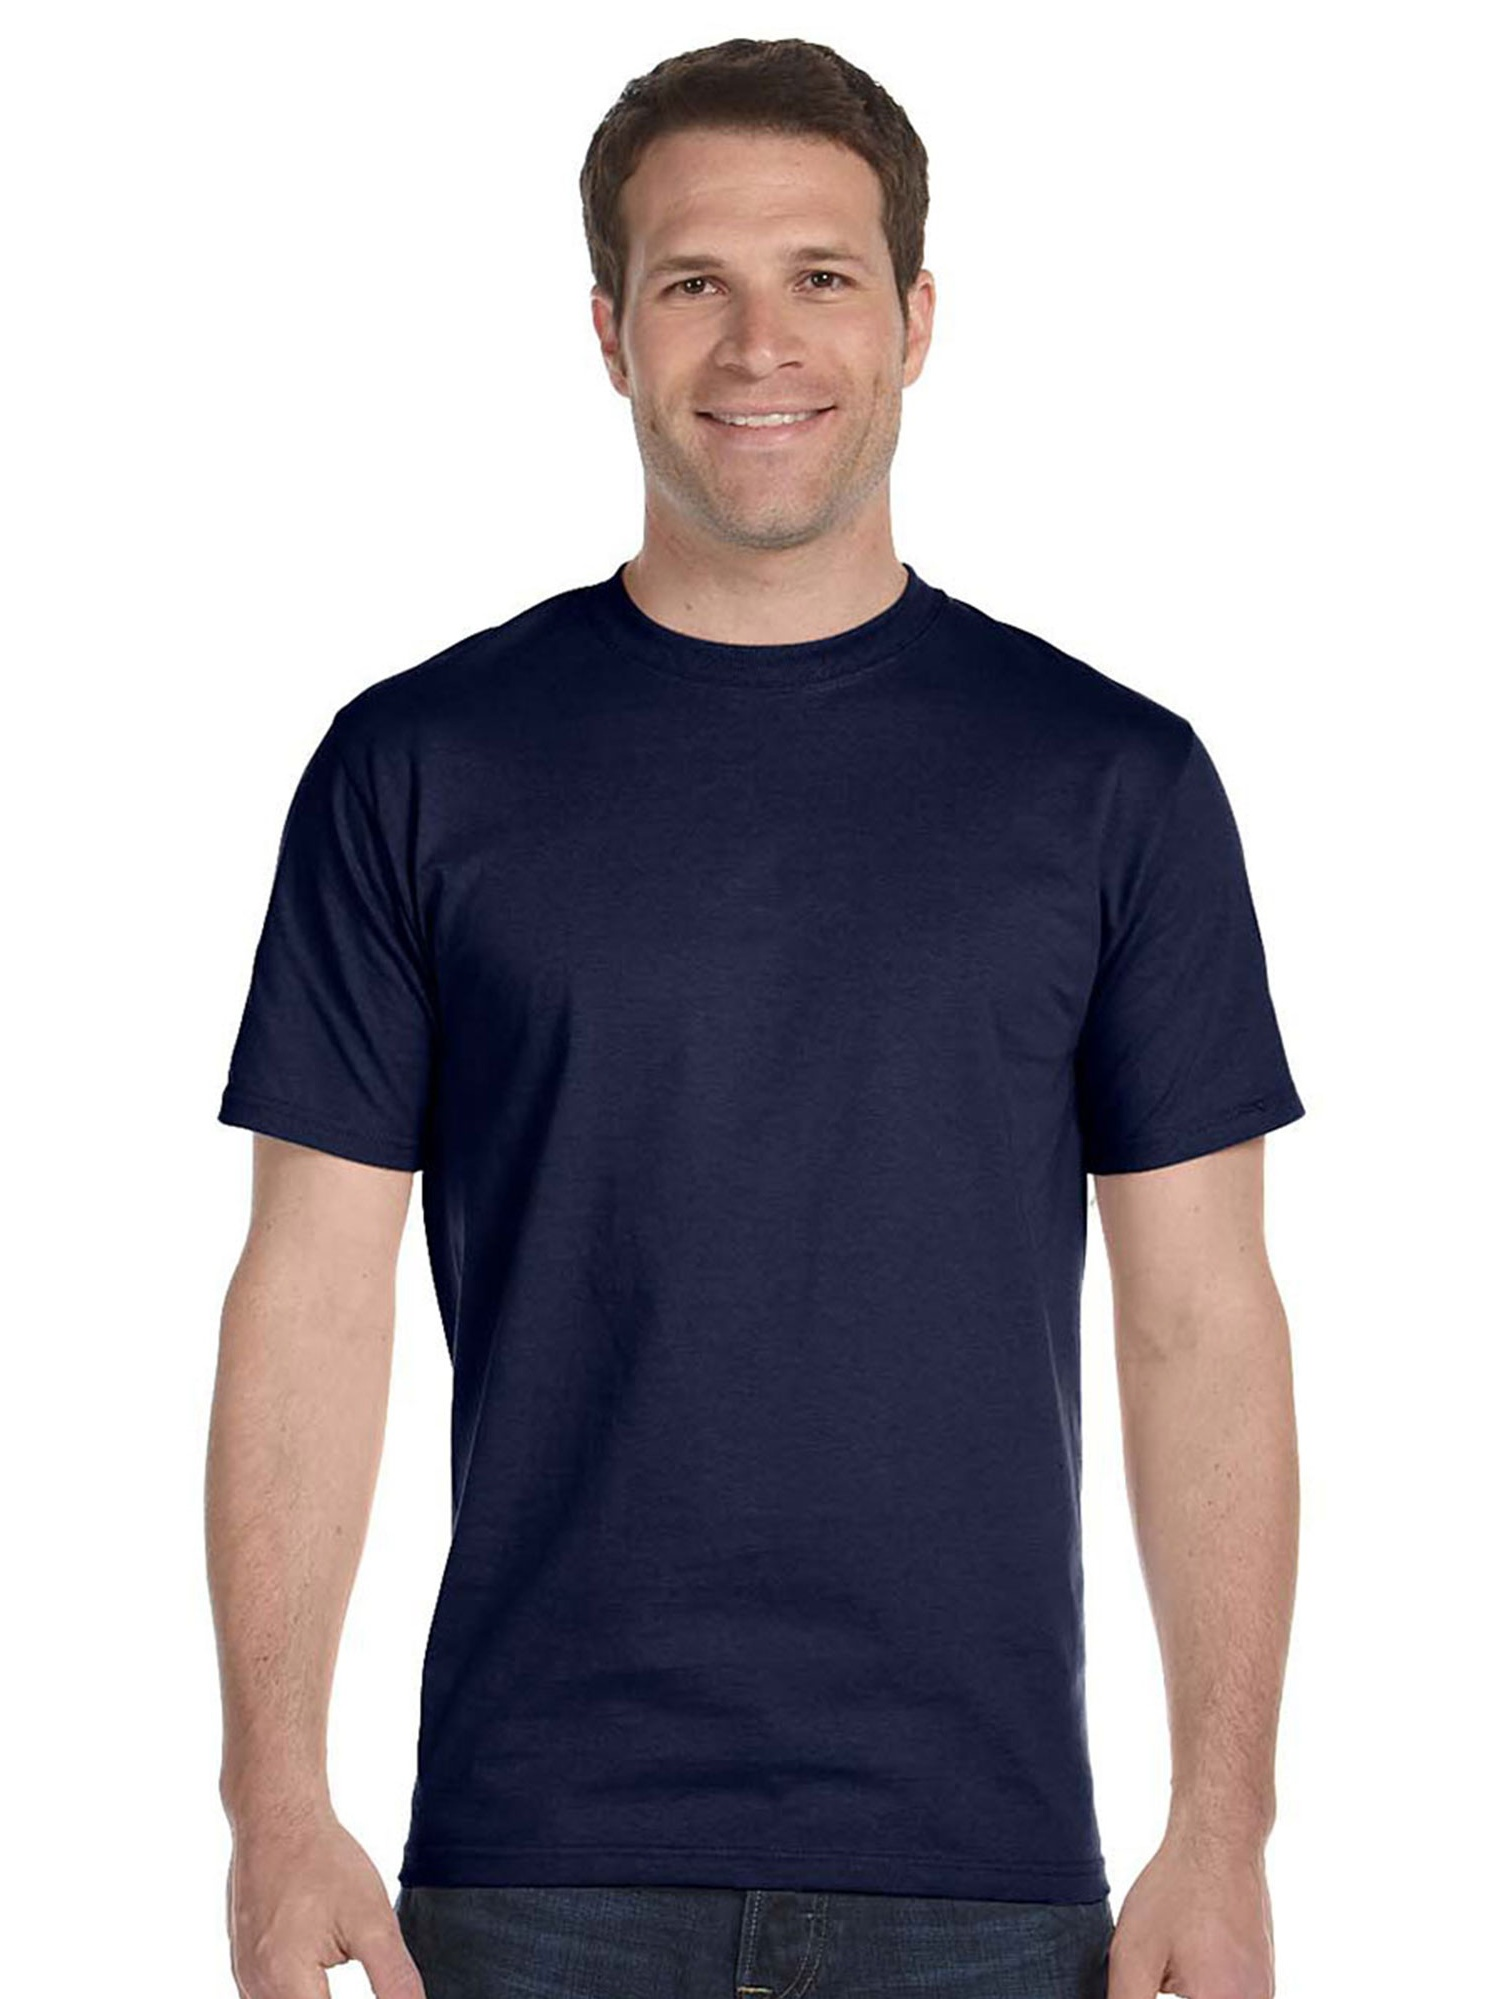 Hanes Men's Short Sleeve Crewneck Beefy Cotton T Shirt